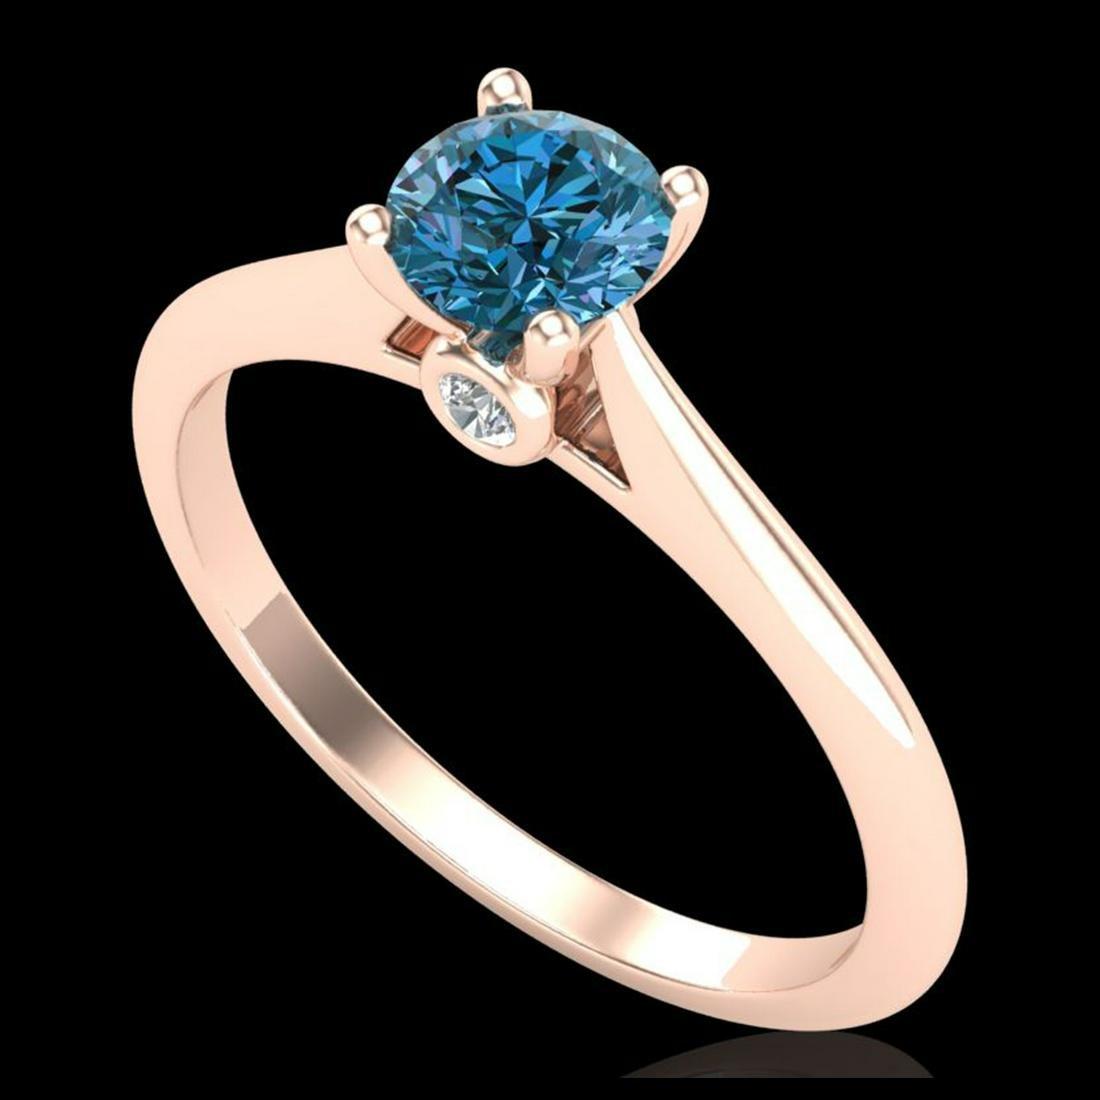 0.56 ctw Fancy Intense Blue Diamond Art Deco Ring 18K